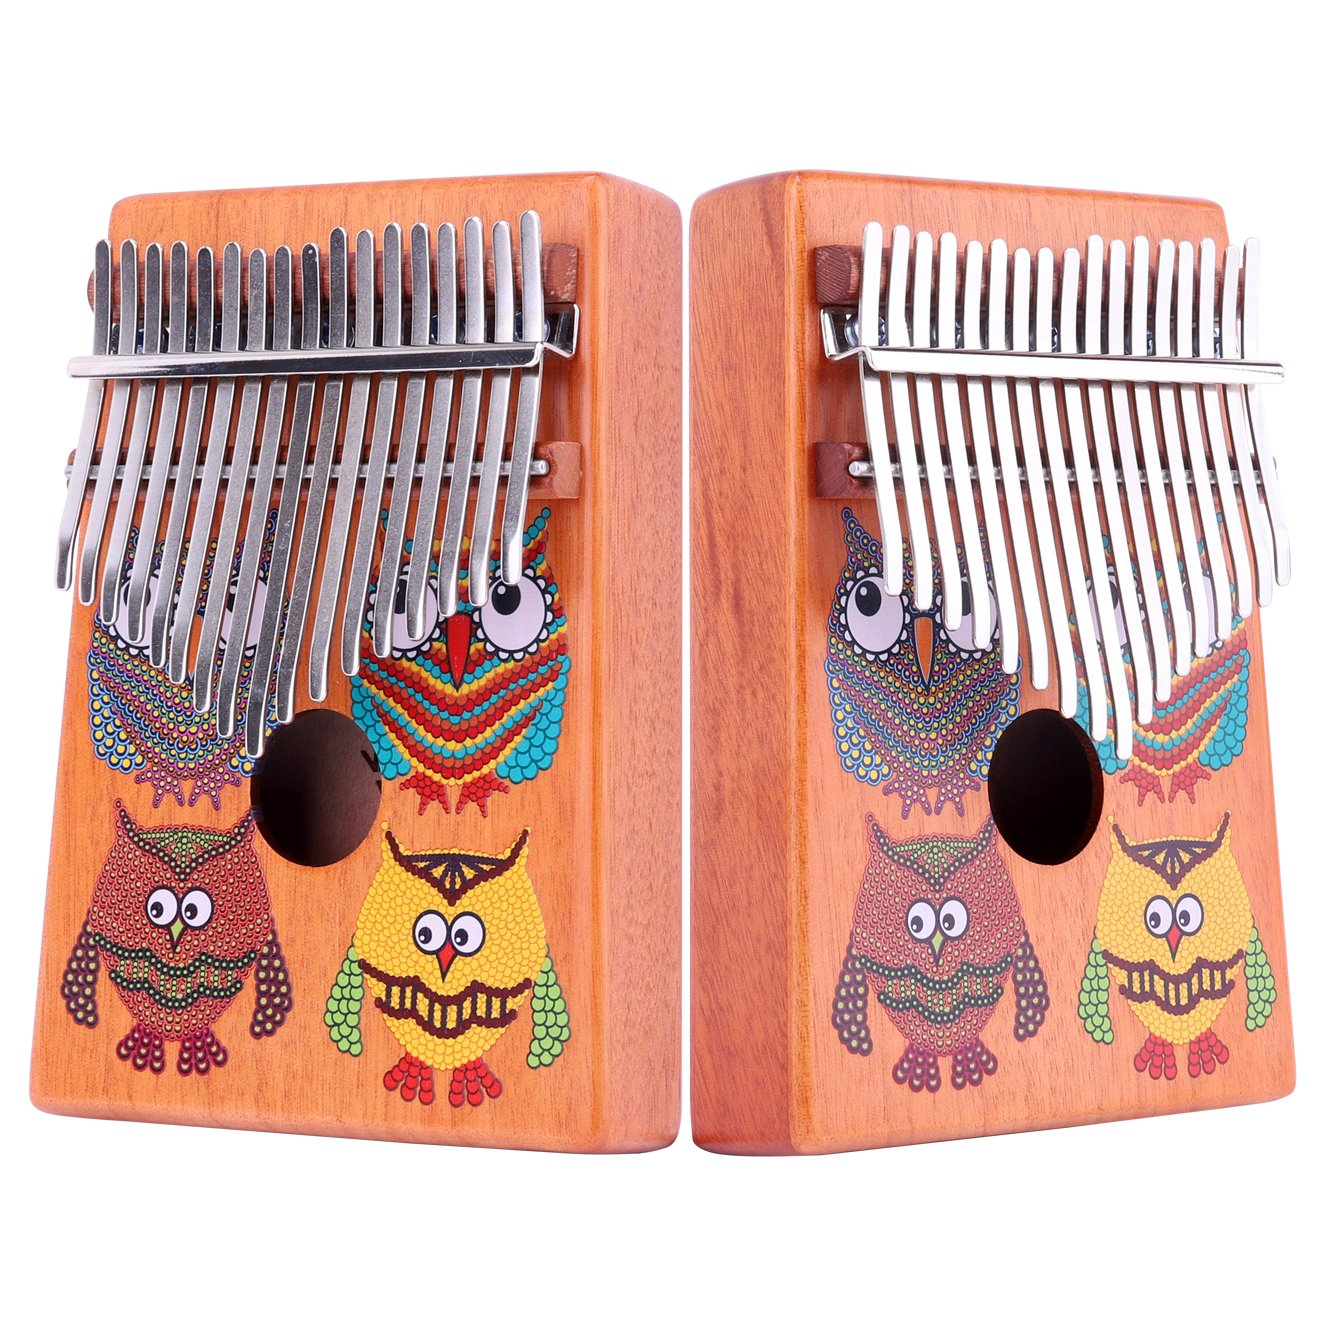 VI VICTORY 17 Key Mahogany Kalimba Colorful African Thumb Piano Finger Percussion Keyboard Music Instruments - Owl by VI VICTORY (Image #2)